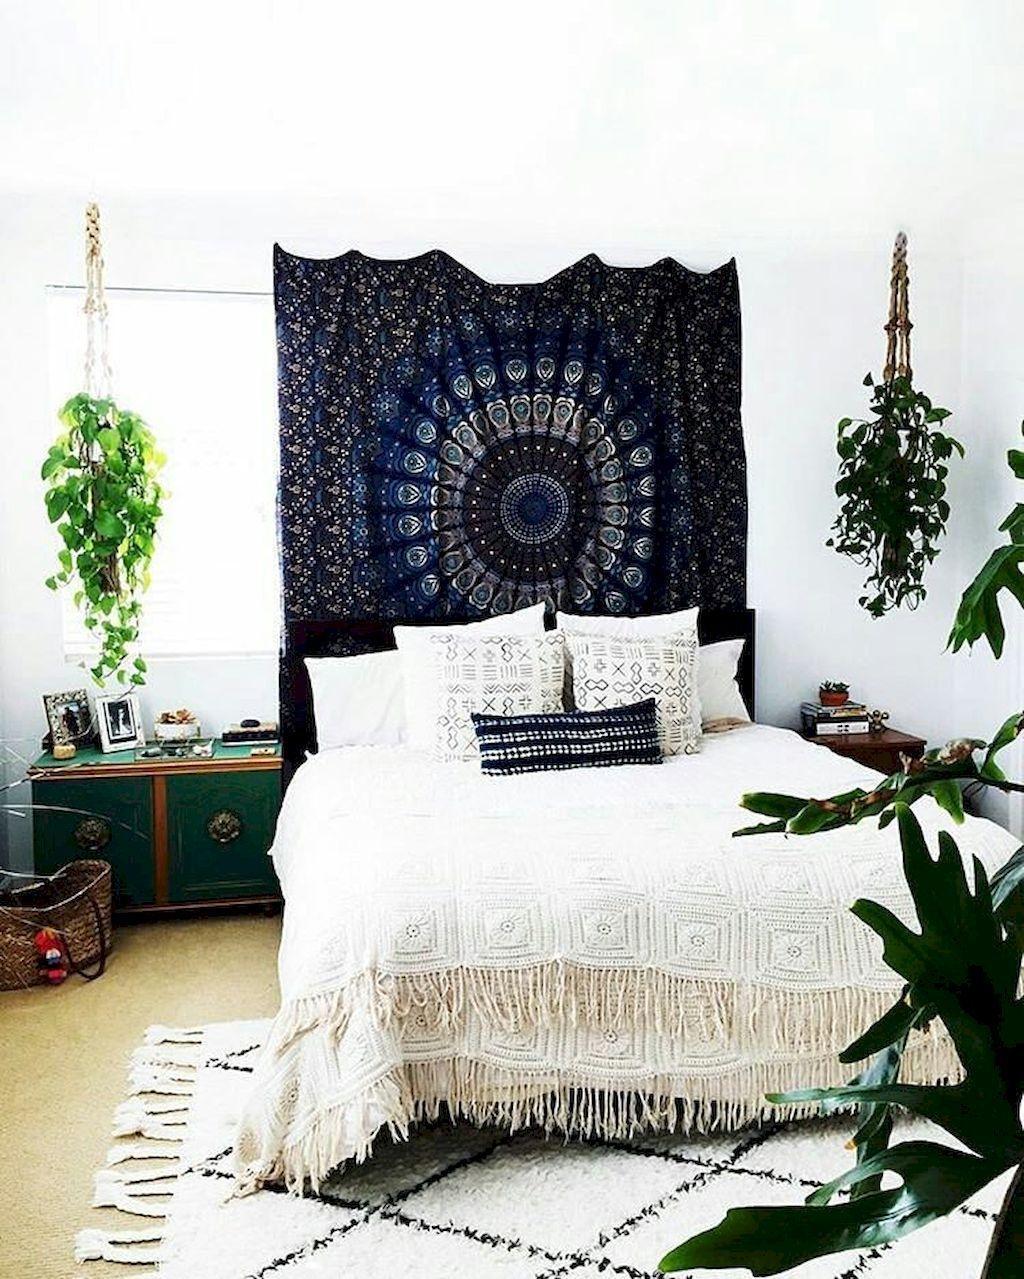 awesome hippie bohemian bedroom idea   40 Unique Bohemian Bedroom Decoration Ideas 32 – HomeDecorish